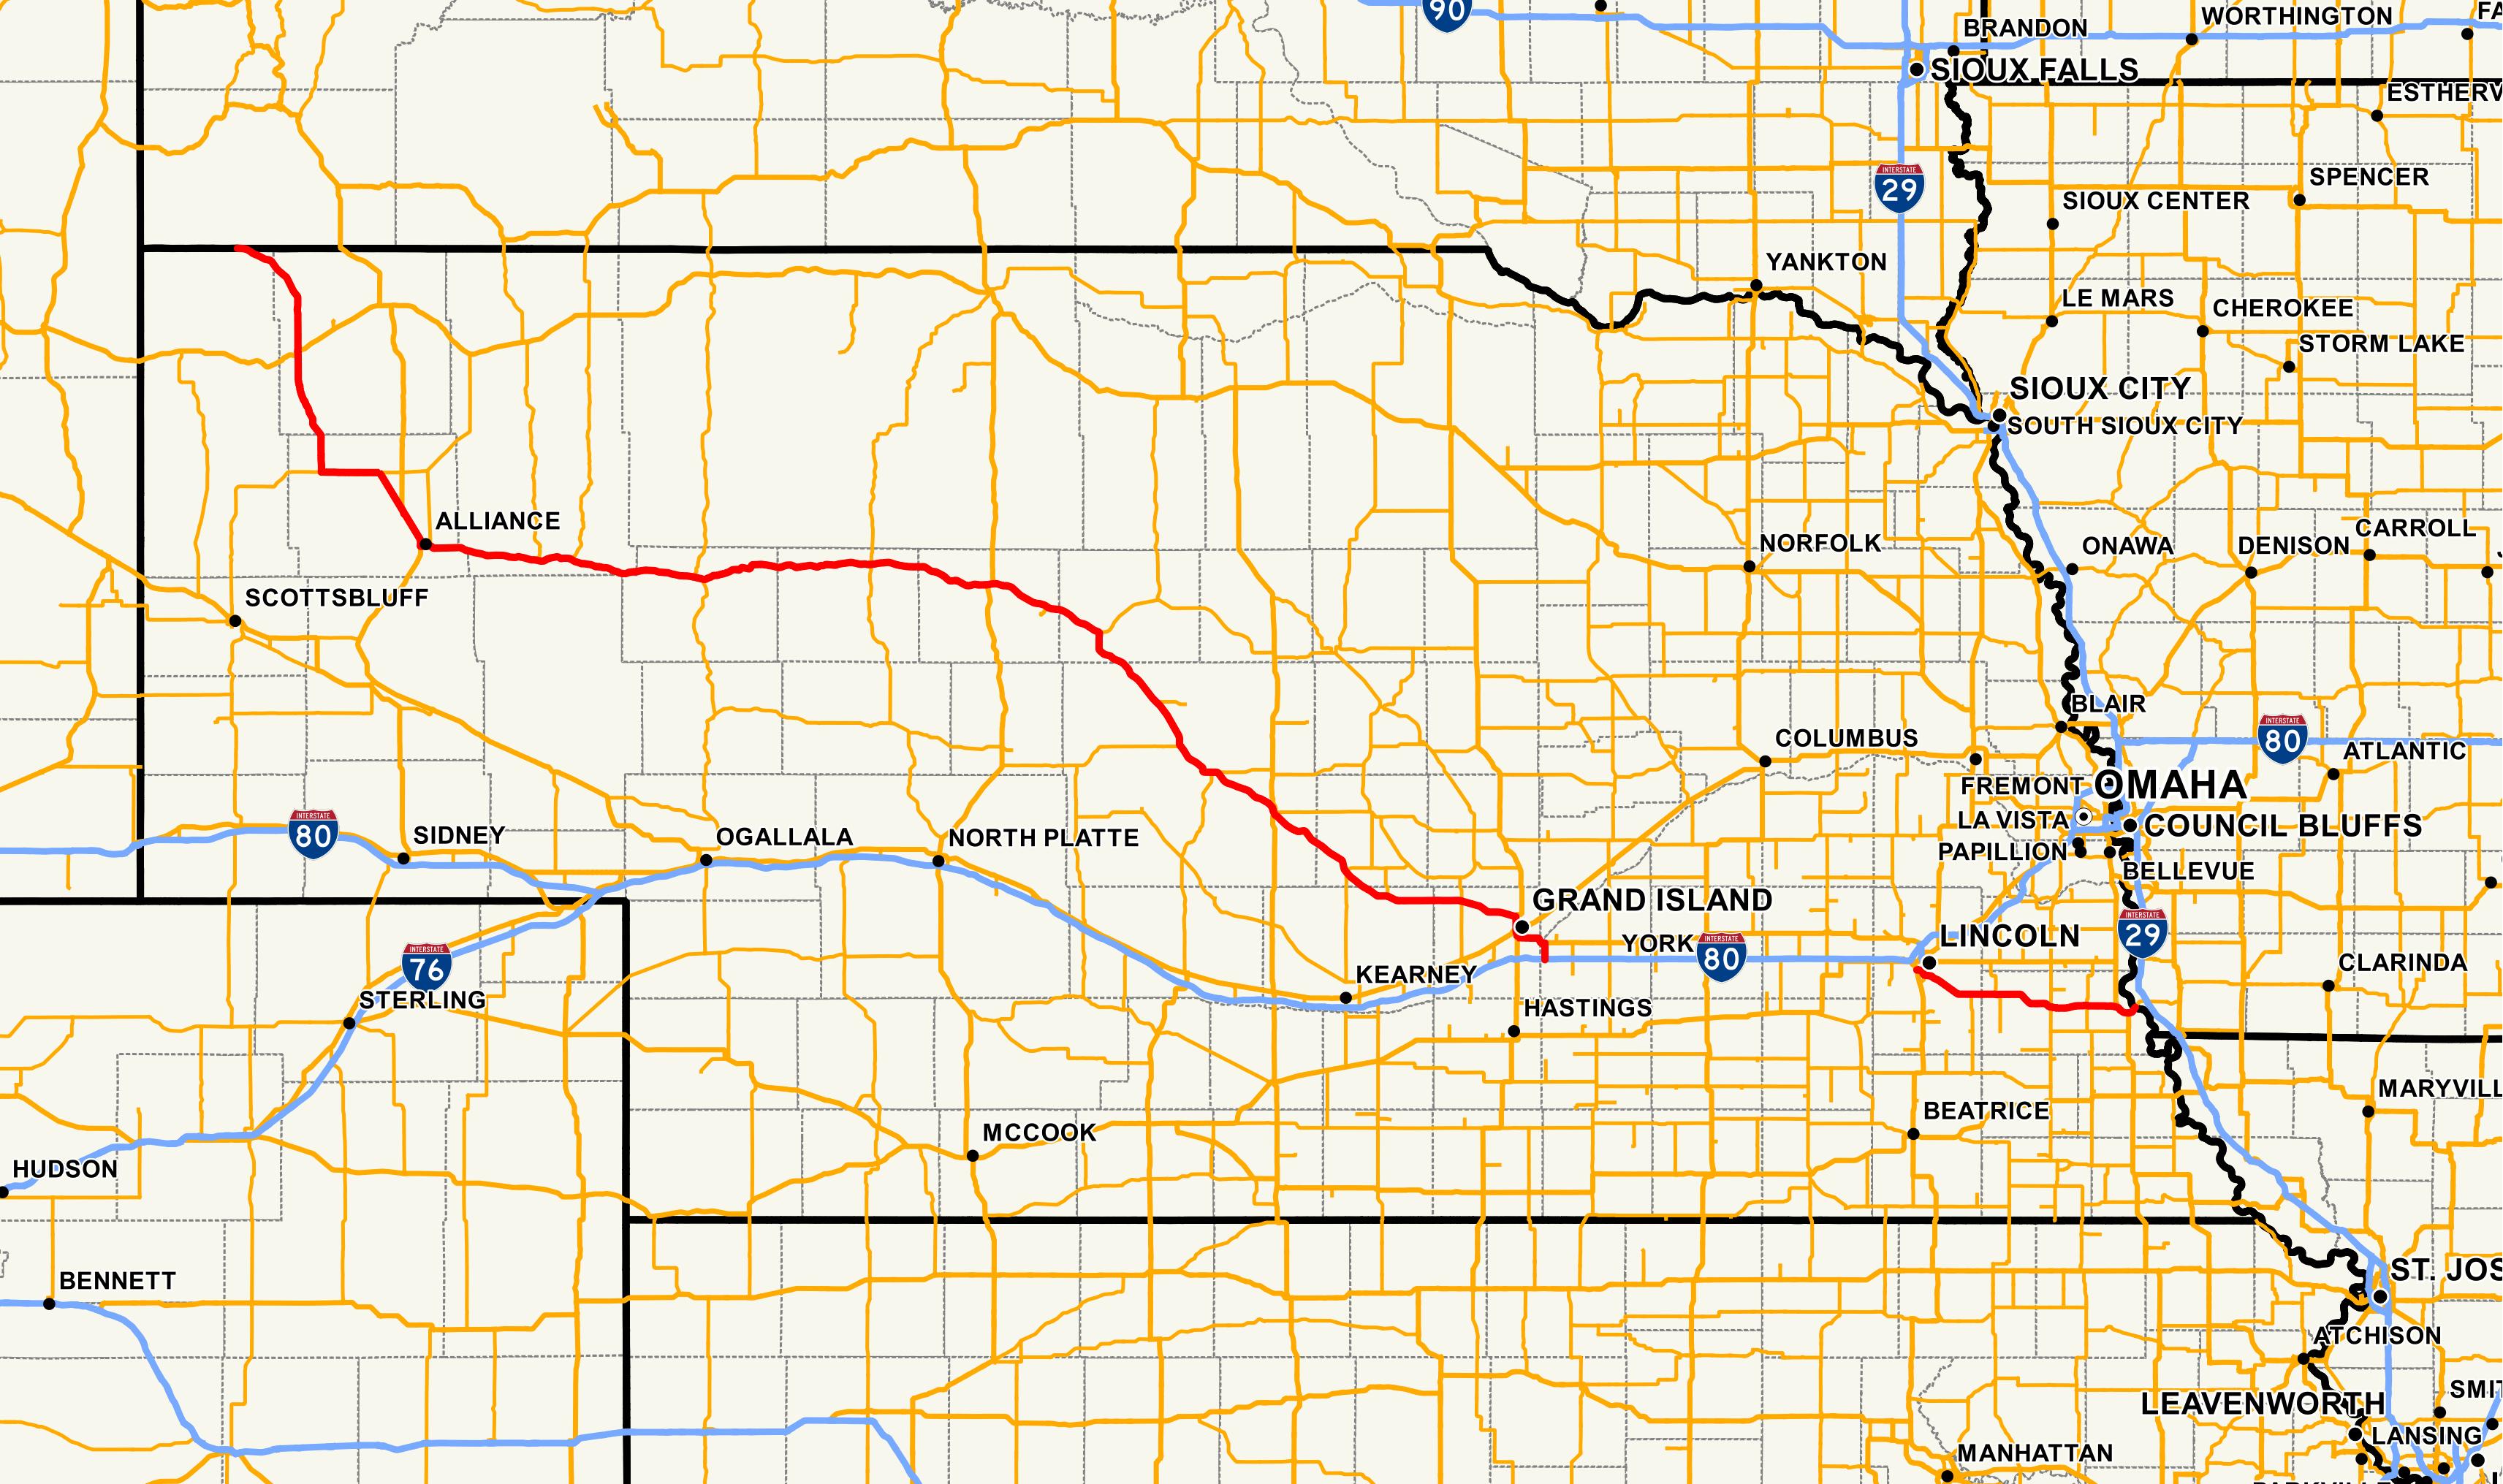 nebraska highway 2 - wikipedia